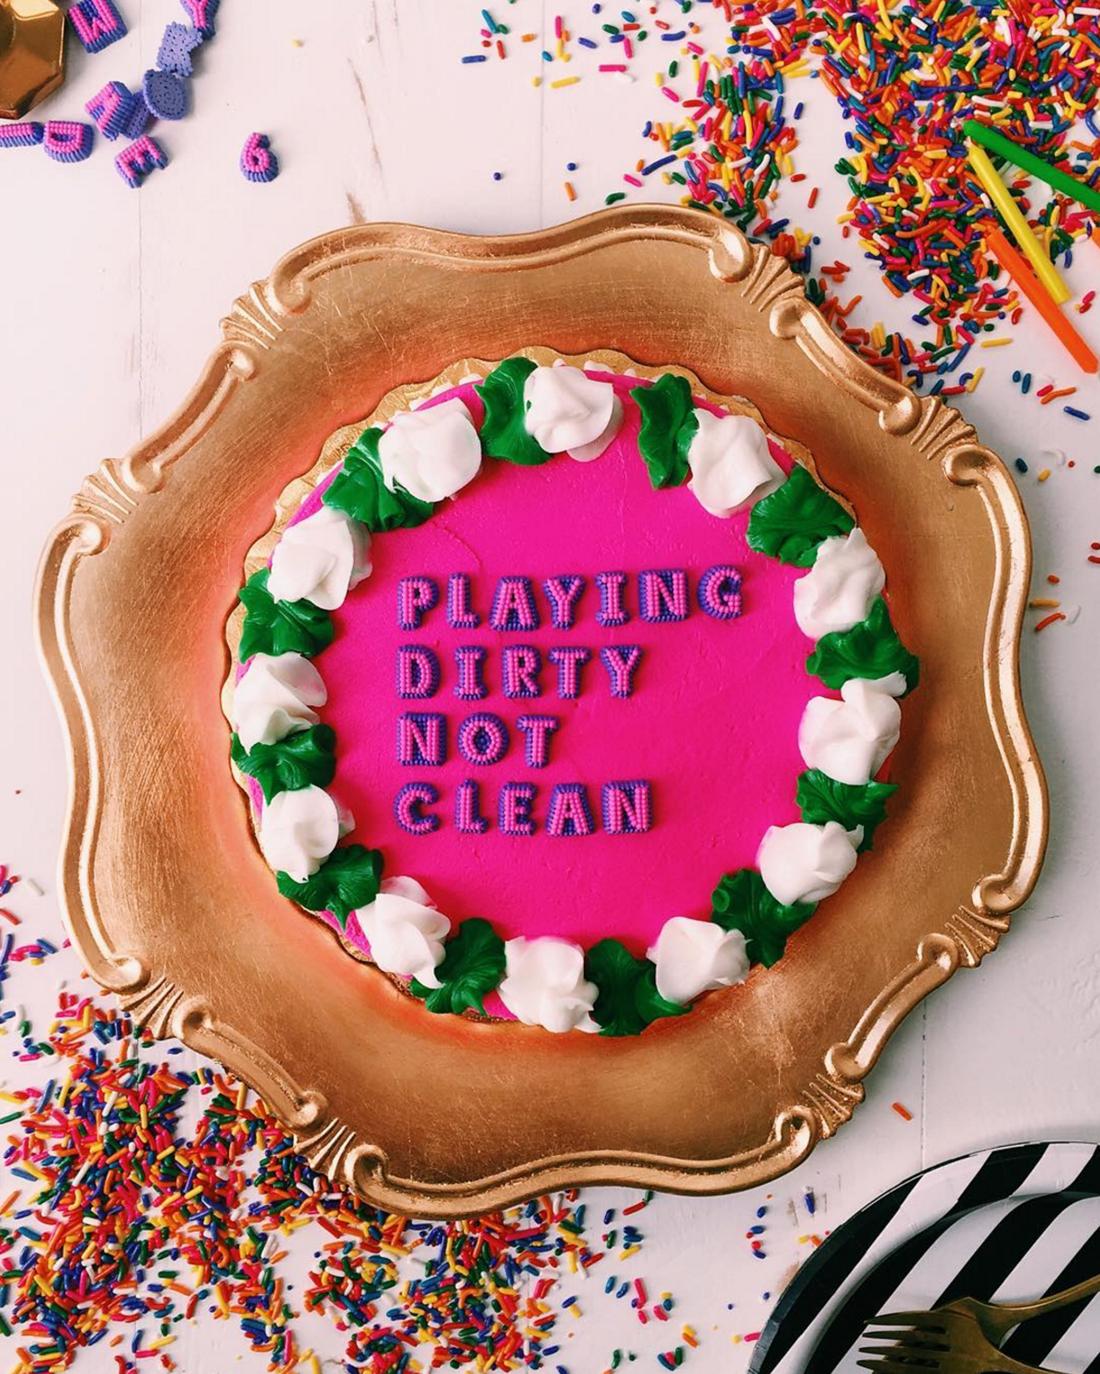 Drake Lyrics On Cake By Joy The Baker Drake lyrics Cake and